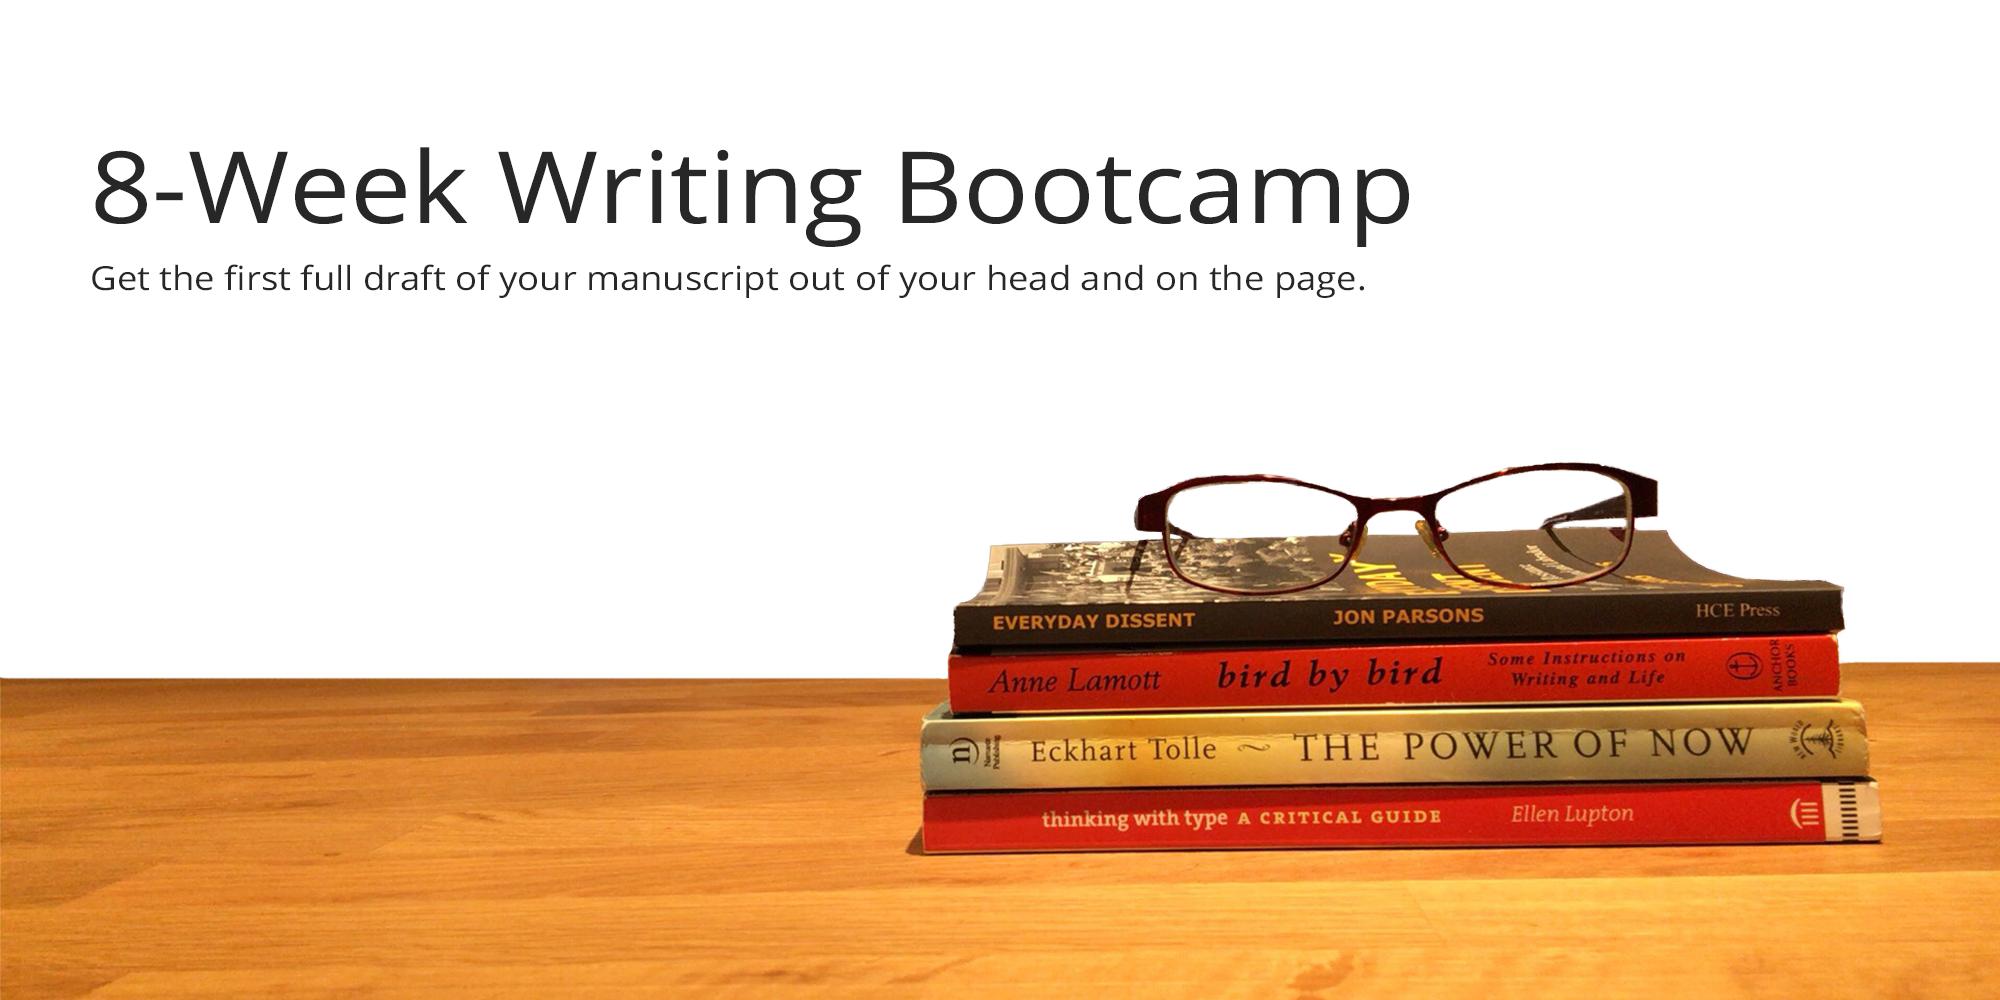 8-Week Writing Bootcamp